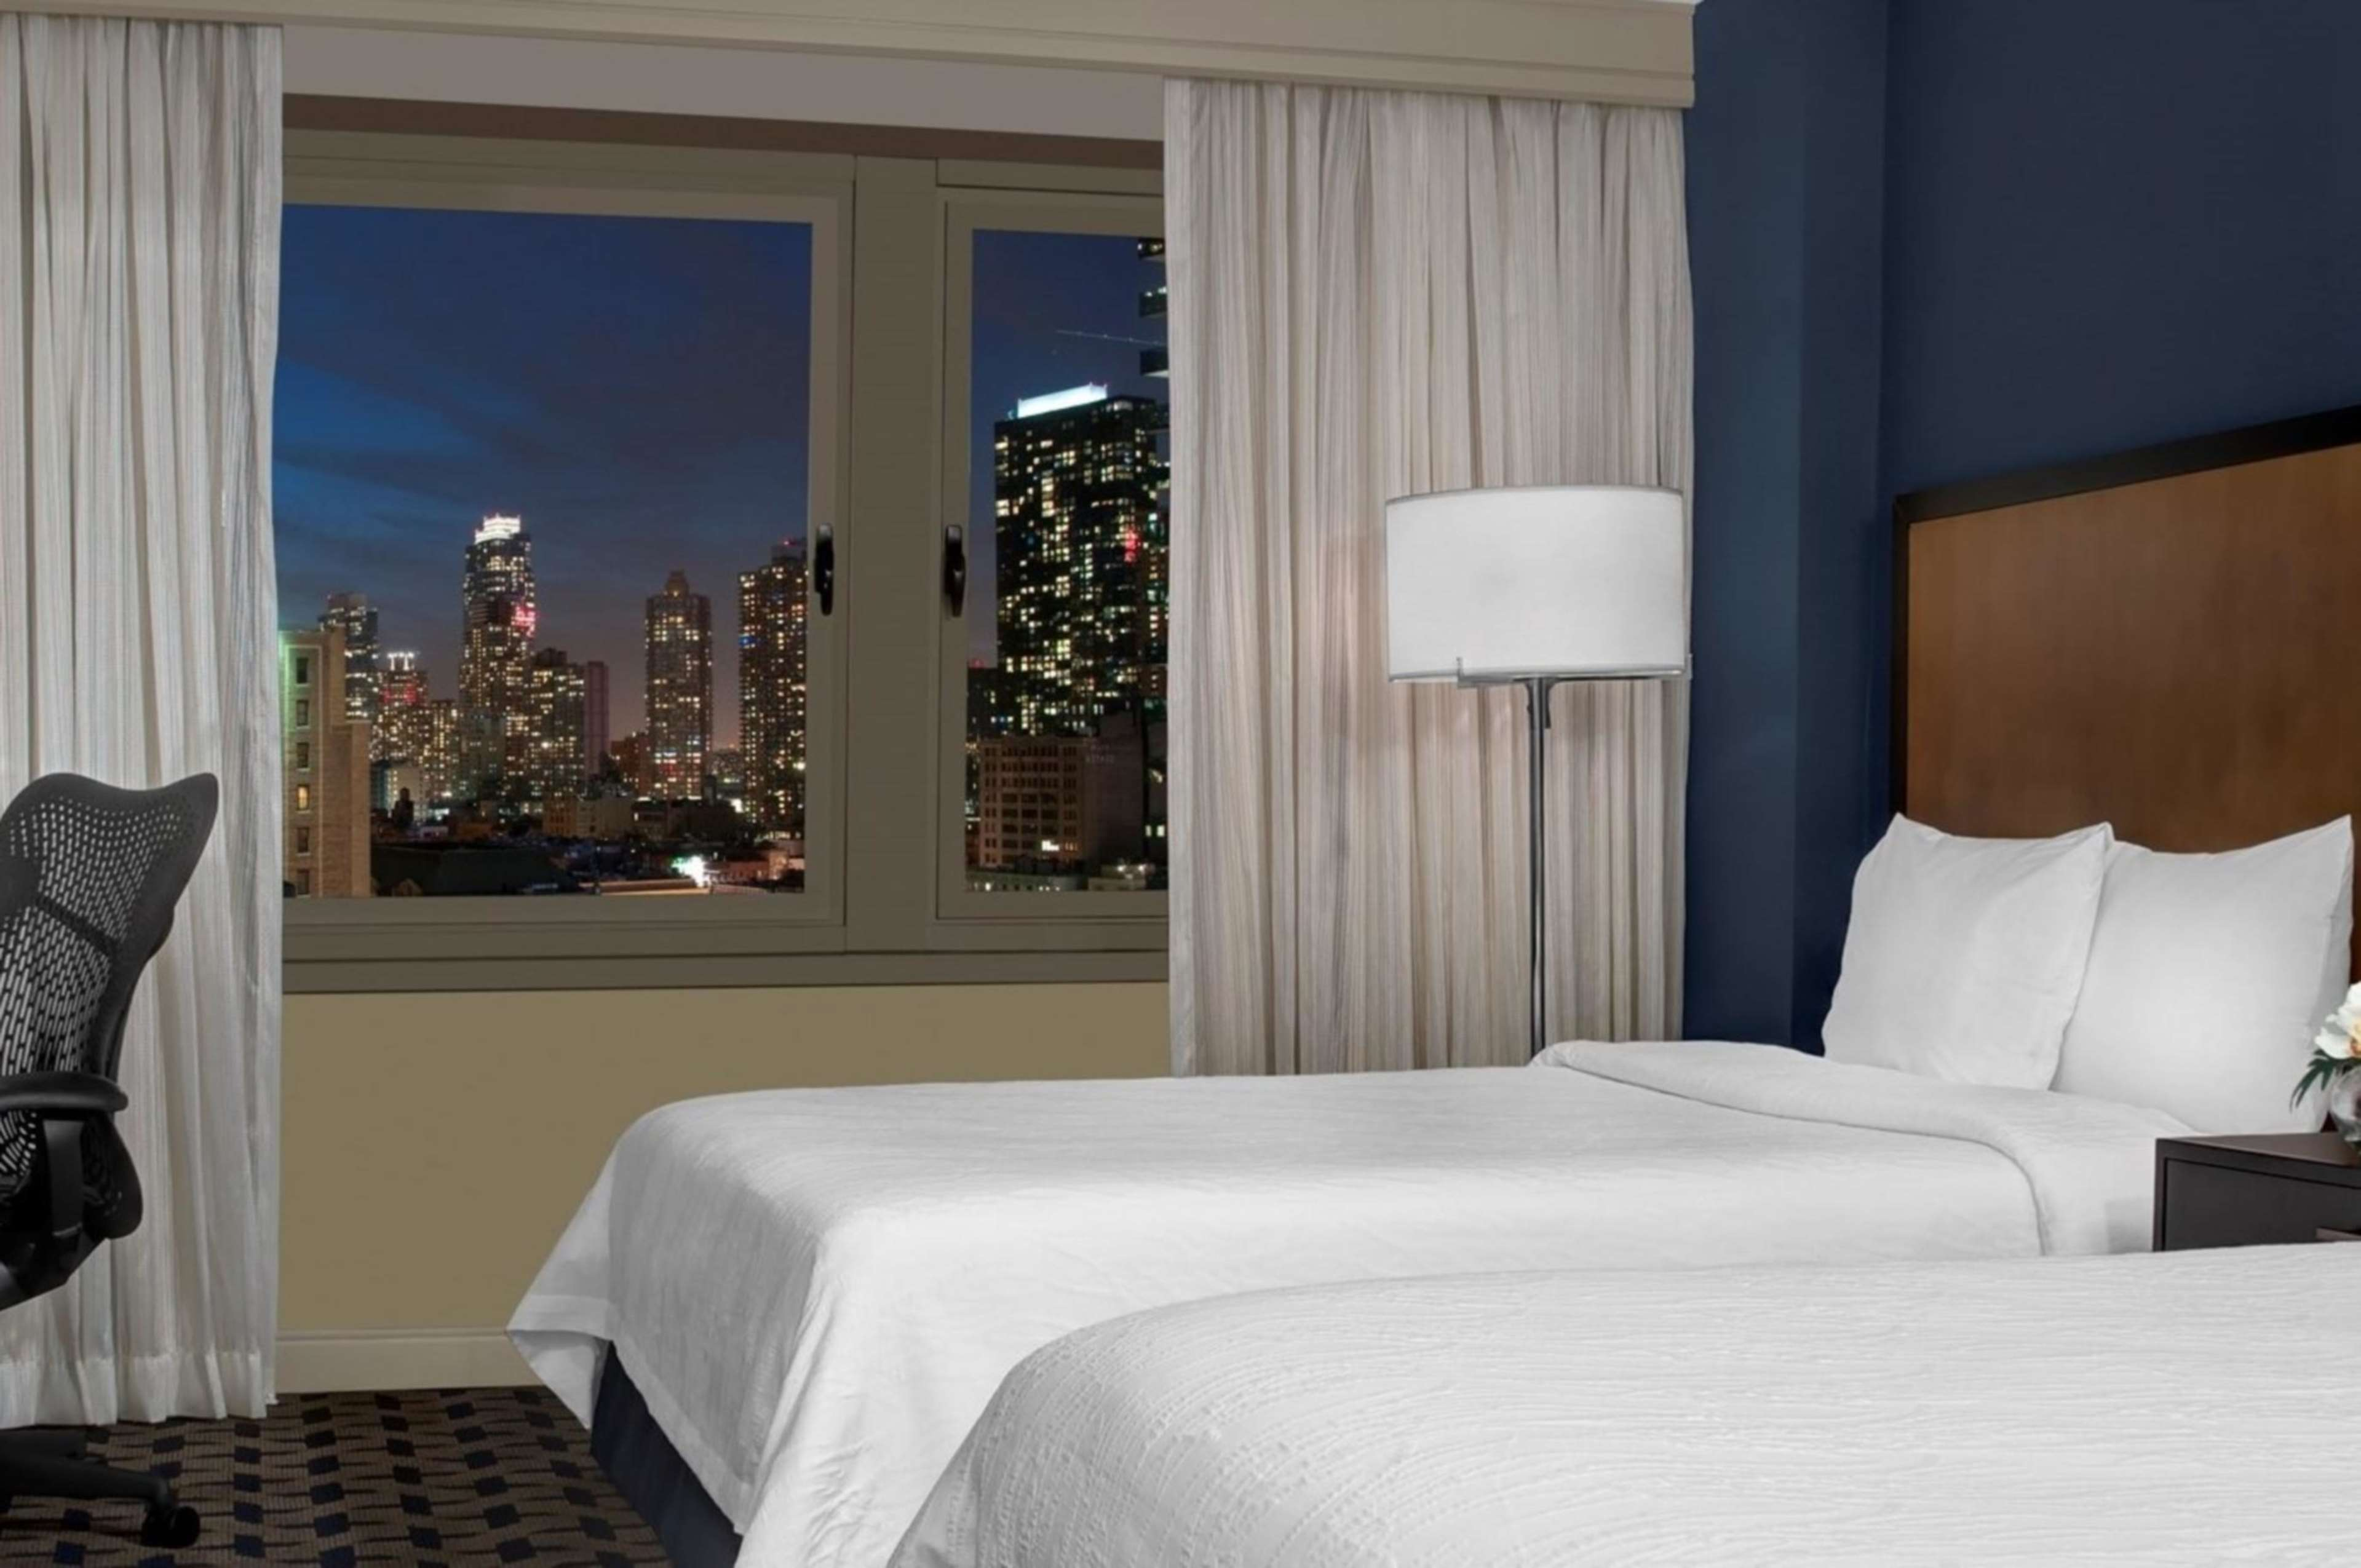 Hilton Garden Inn Times Square image 0